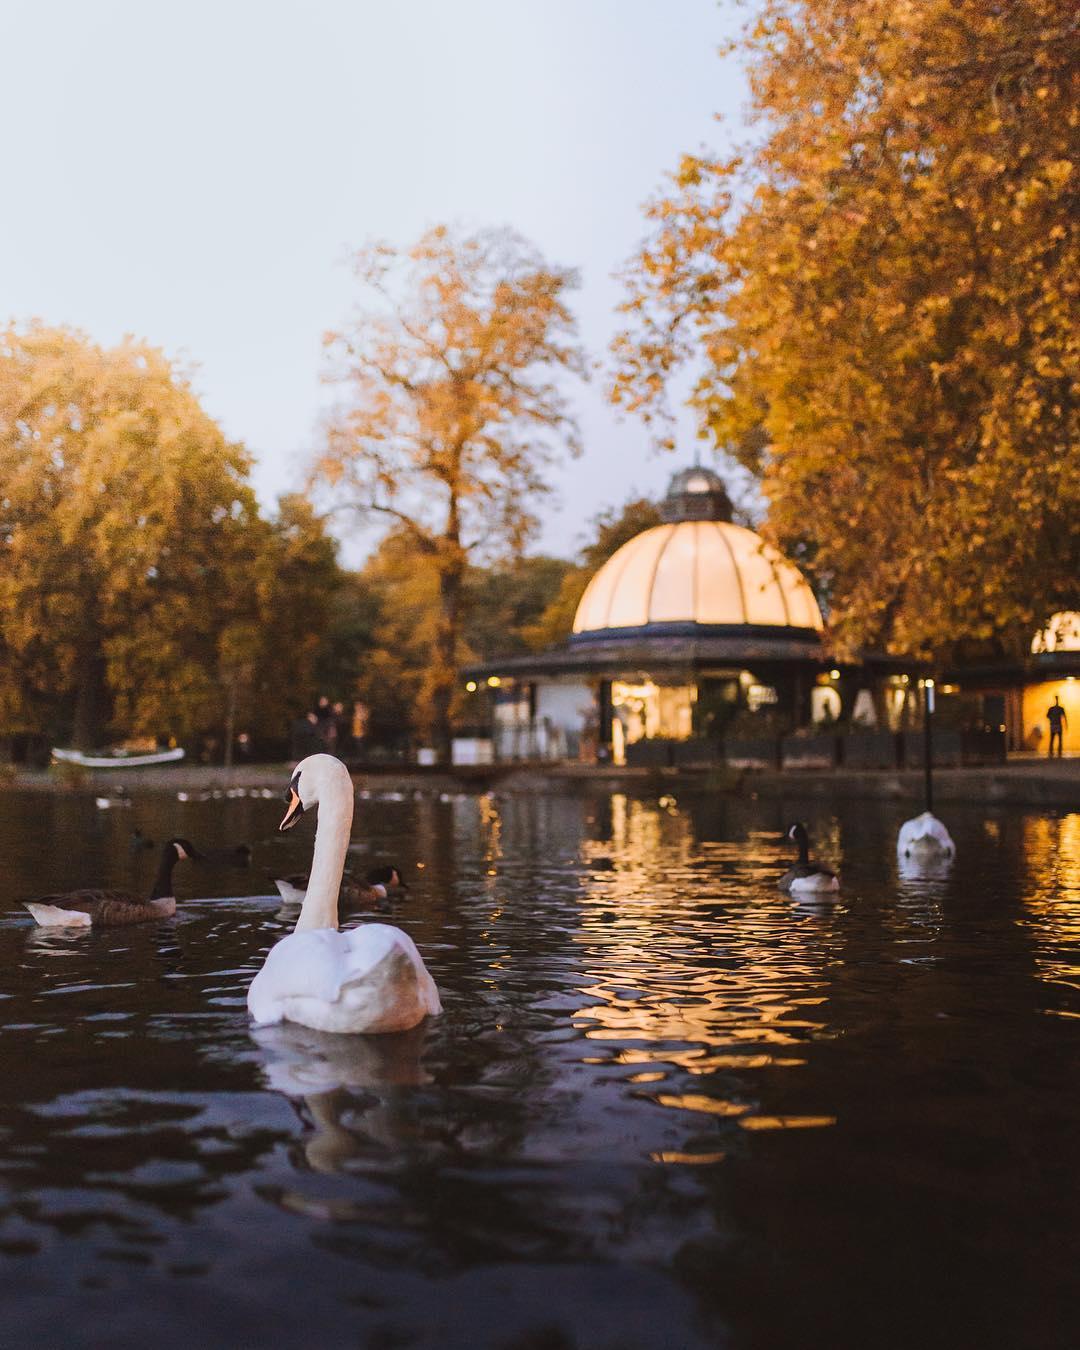 Victoria Park London photo - autumn